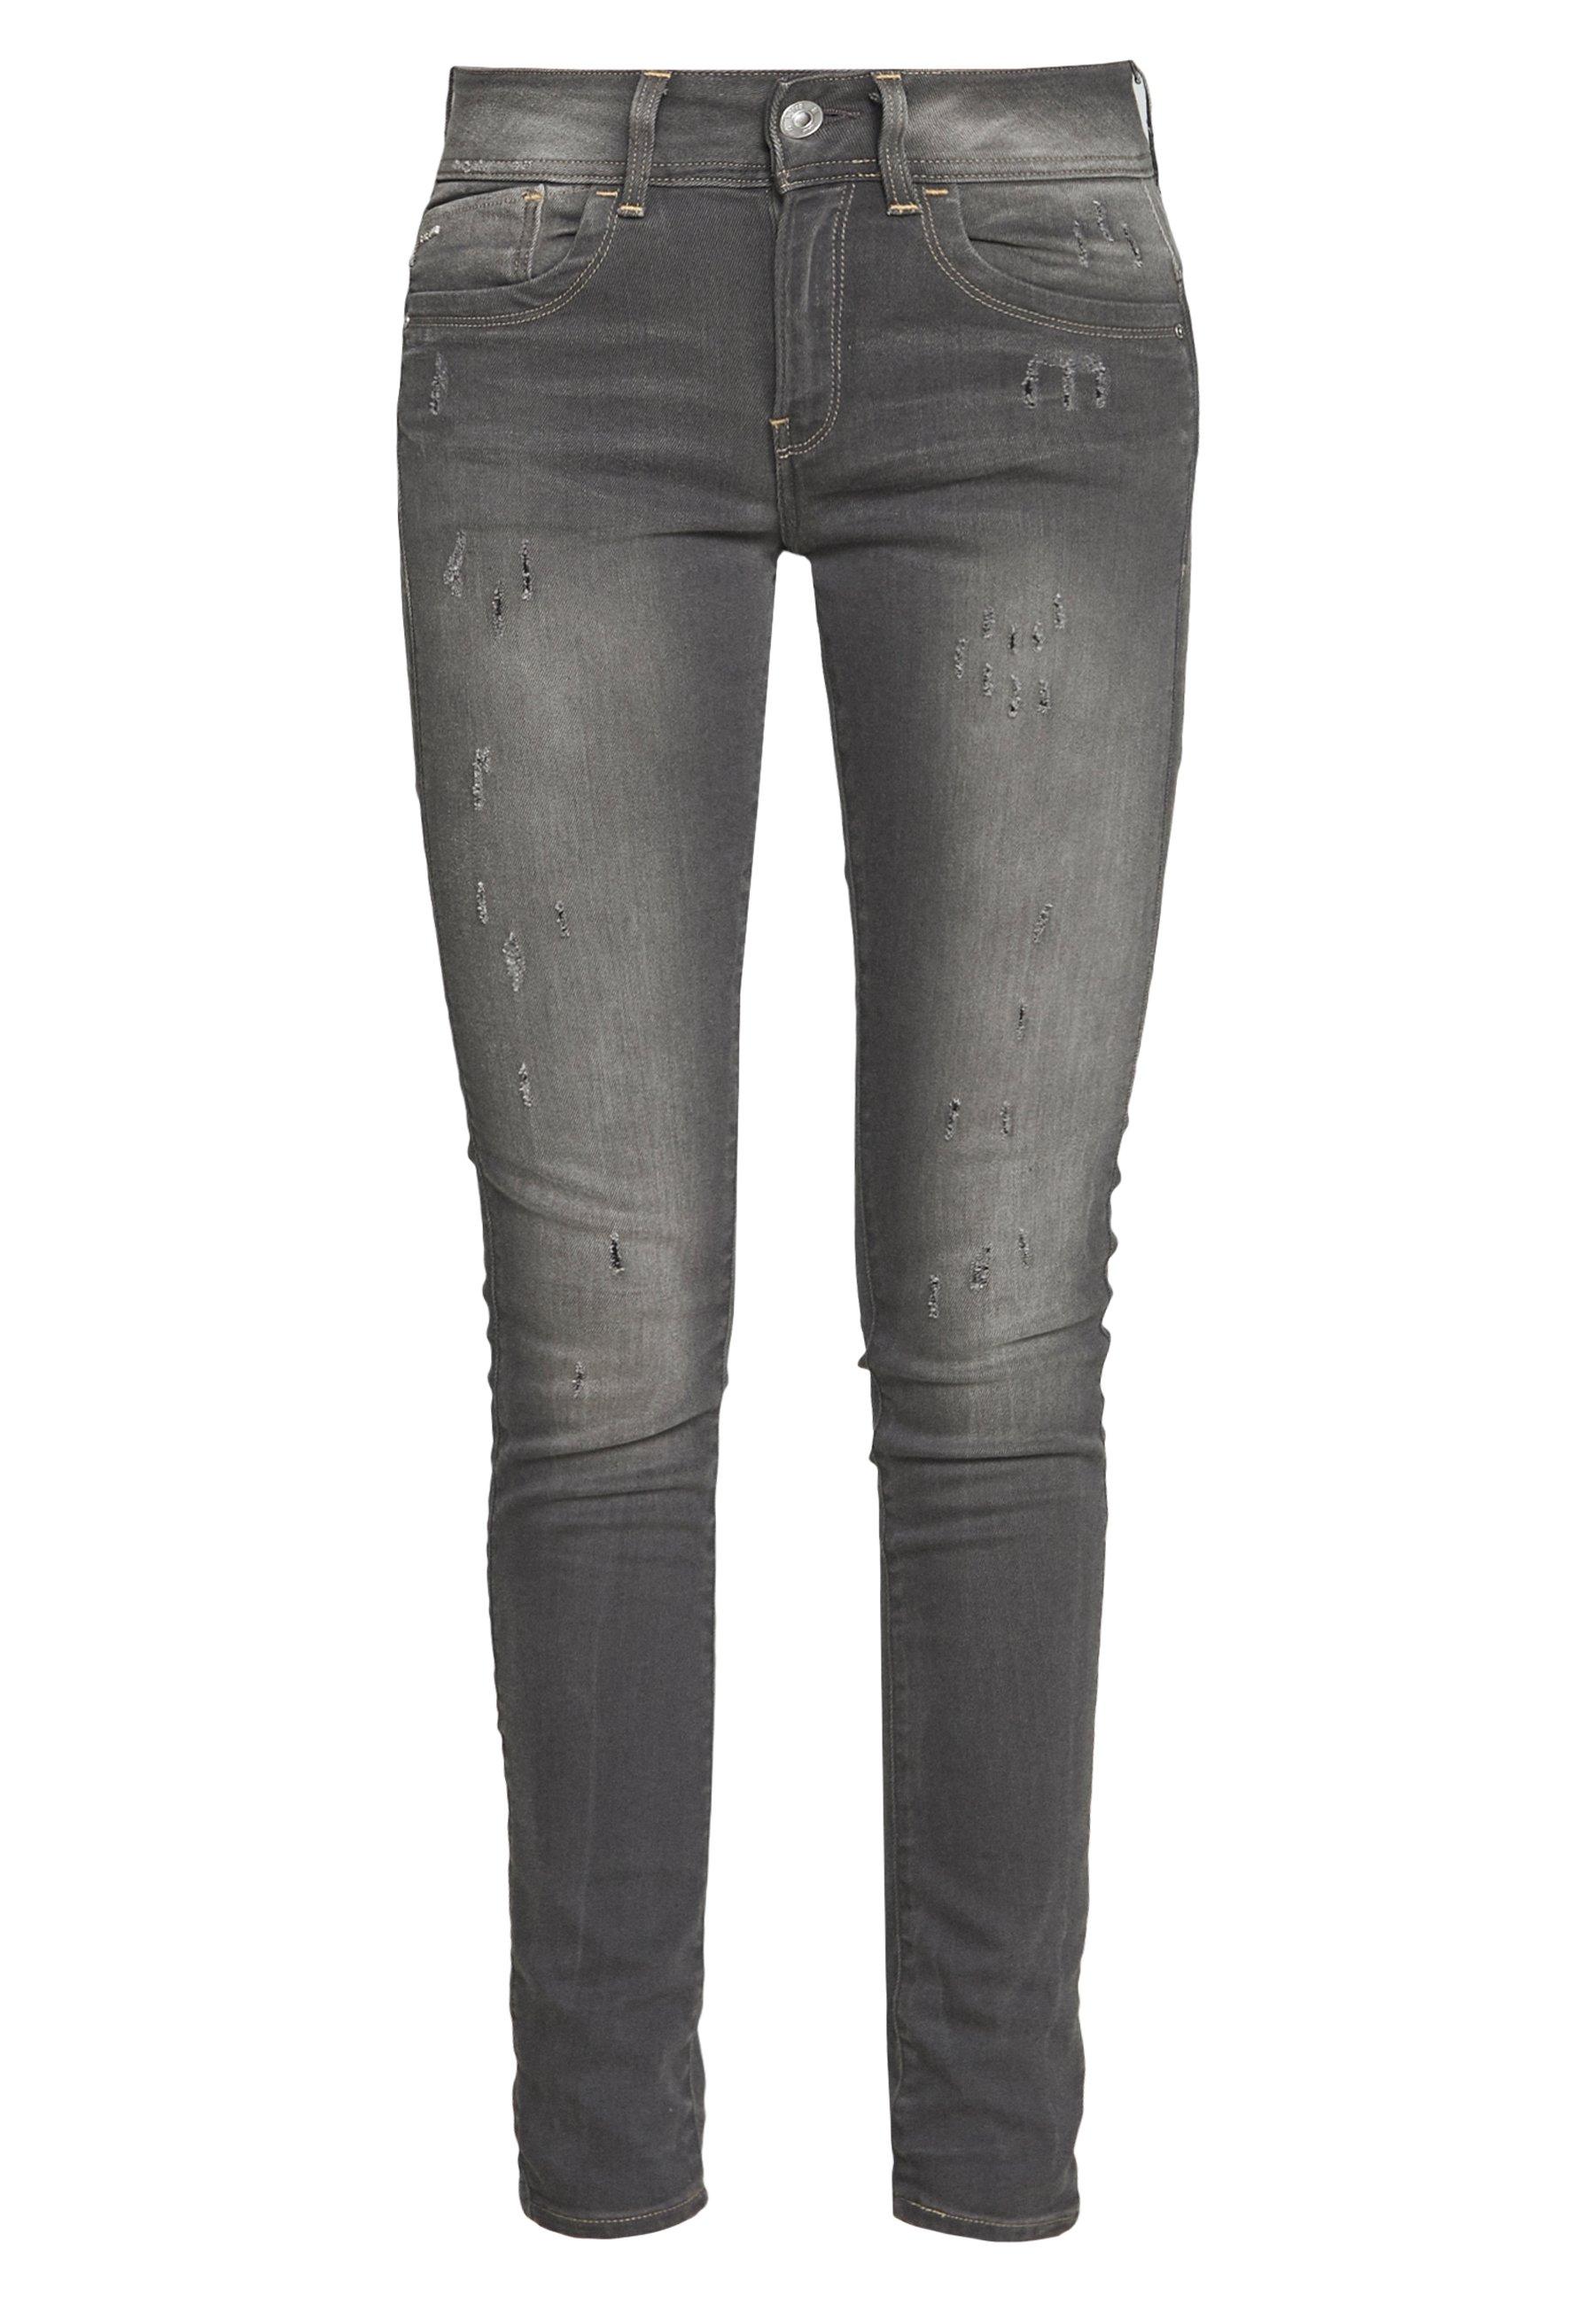 G-star Lynn Mid Skinny Wmn New - Jeans Slander Grey Superstretch